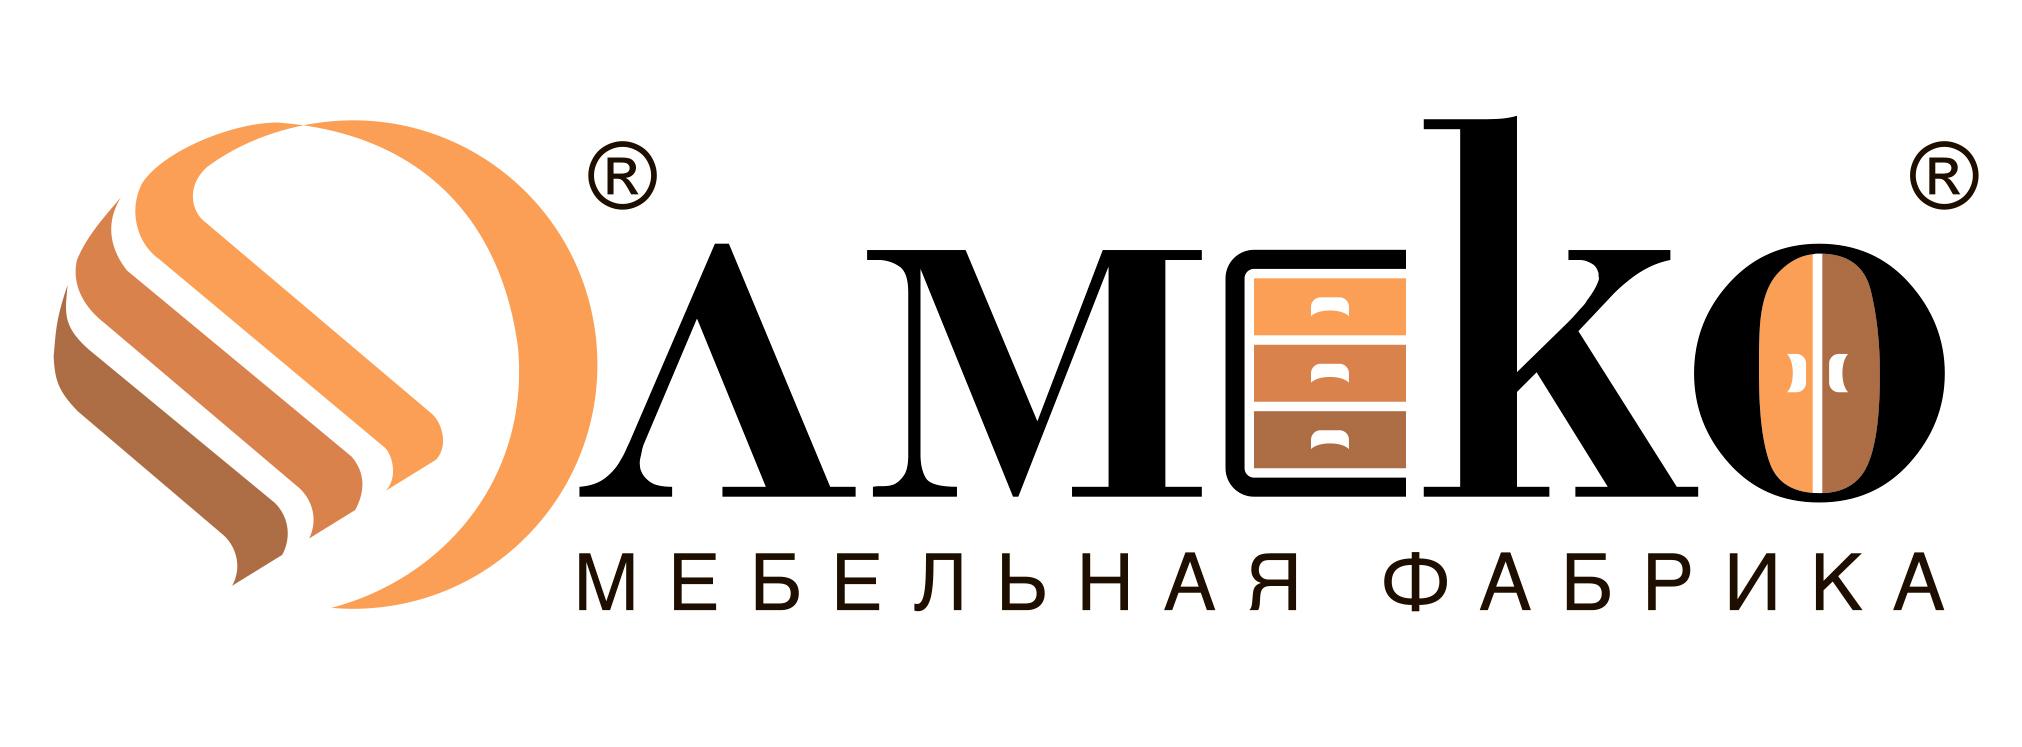 Ребрендинг/Редизайн логотипа Мебельной Фабрики фото f_421548f3f2d85382.jpg